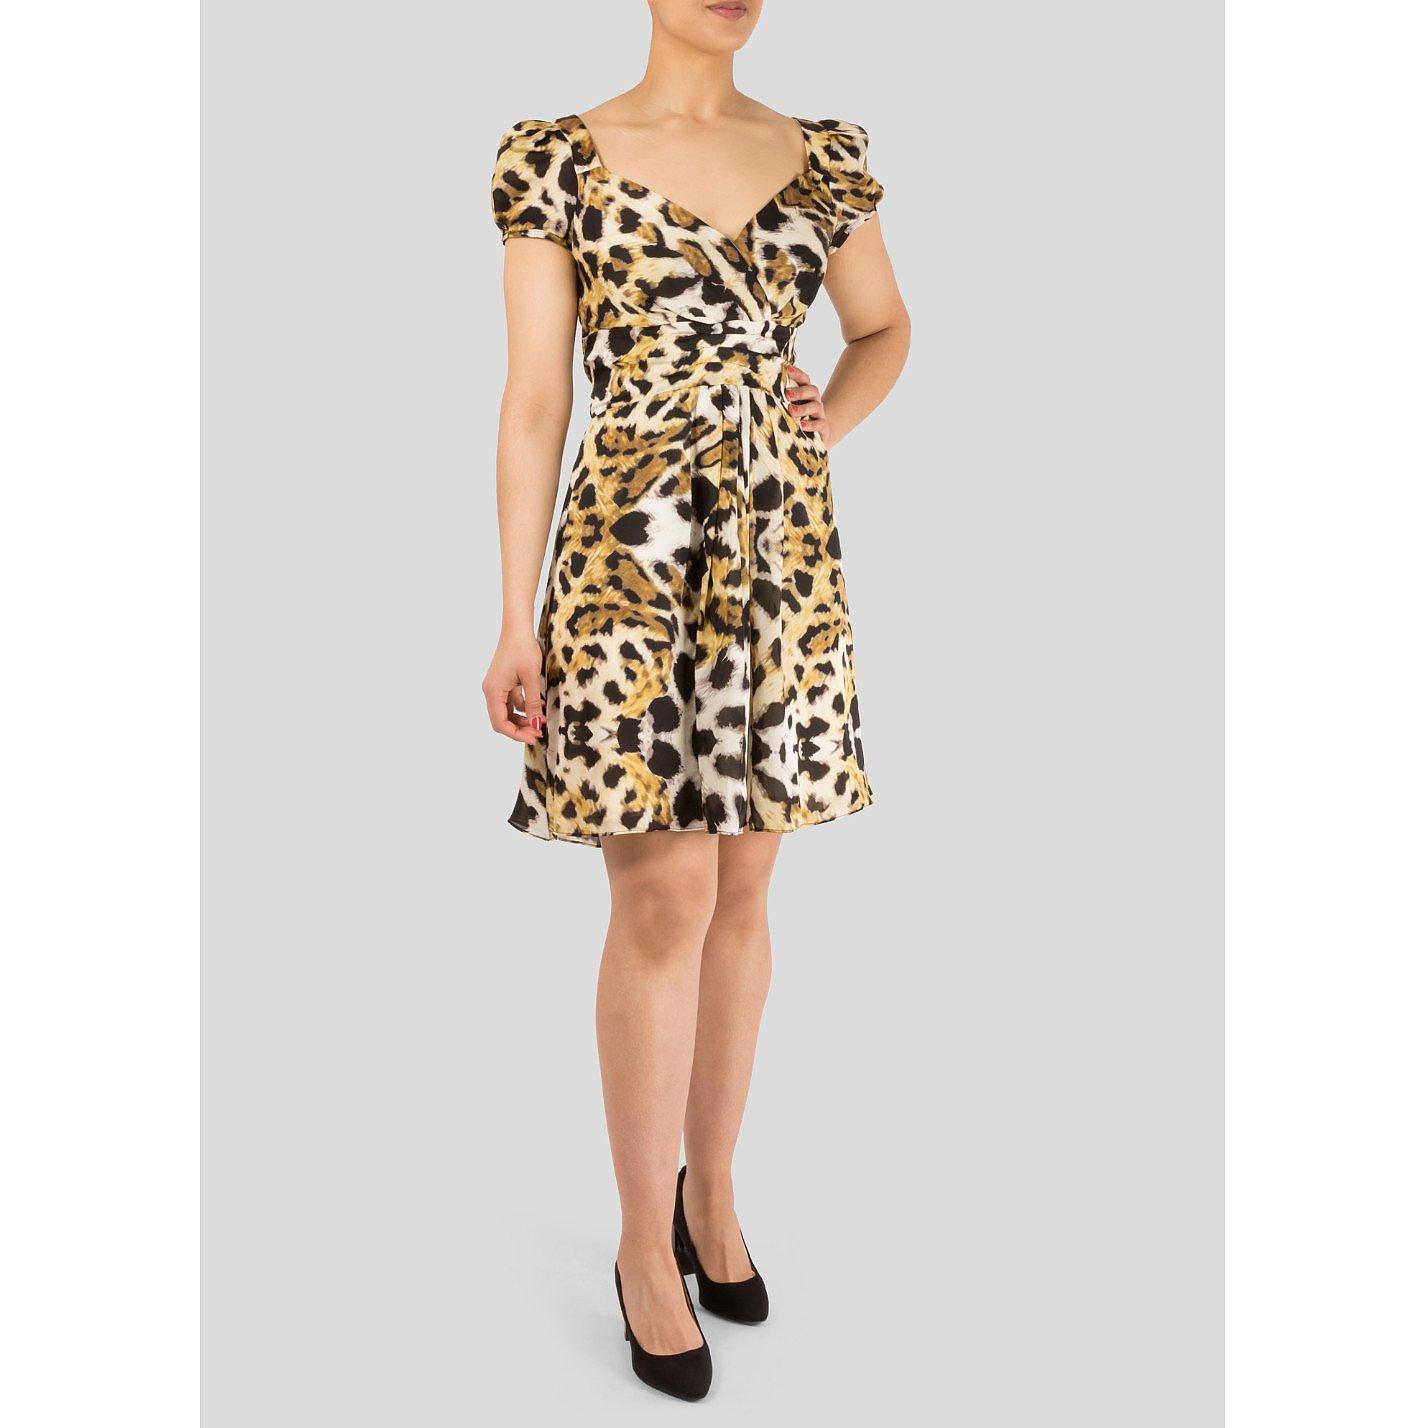 Betsey Johnson Leopard Print Silk Mini Dress